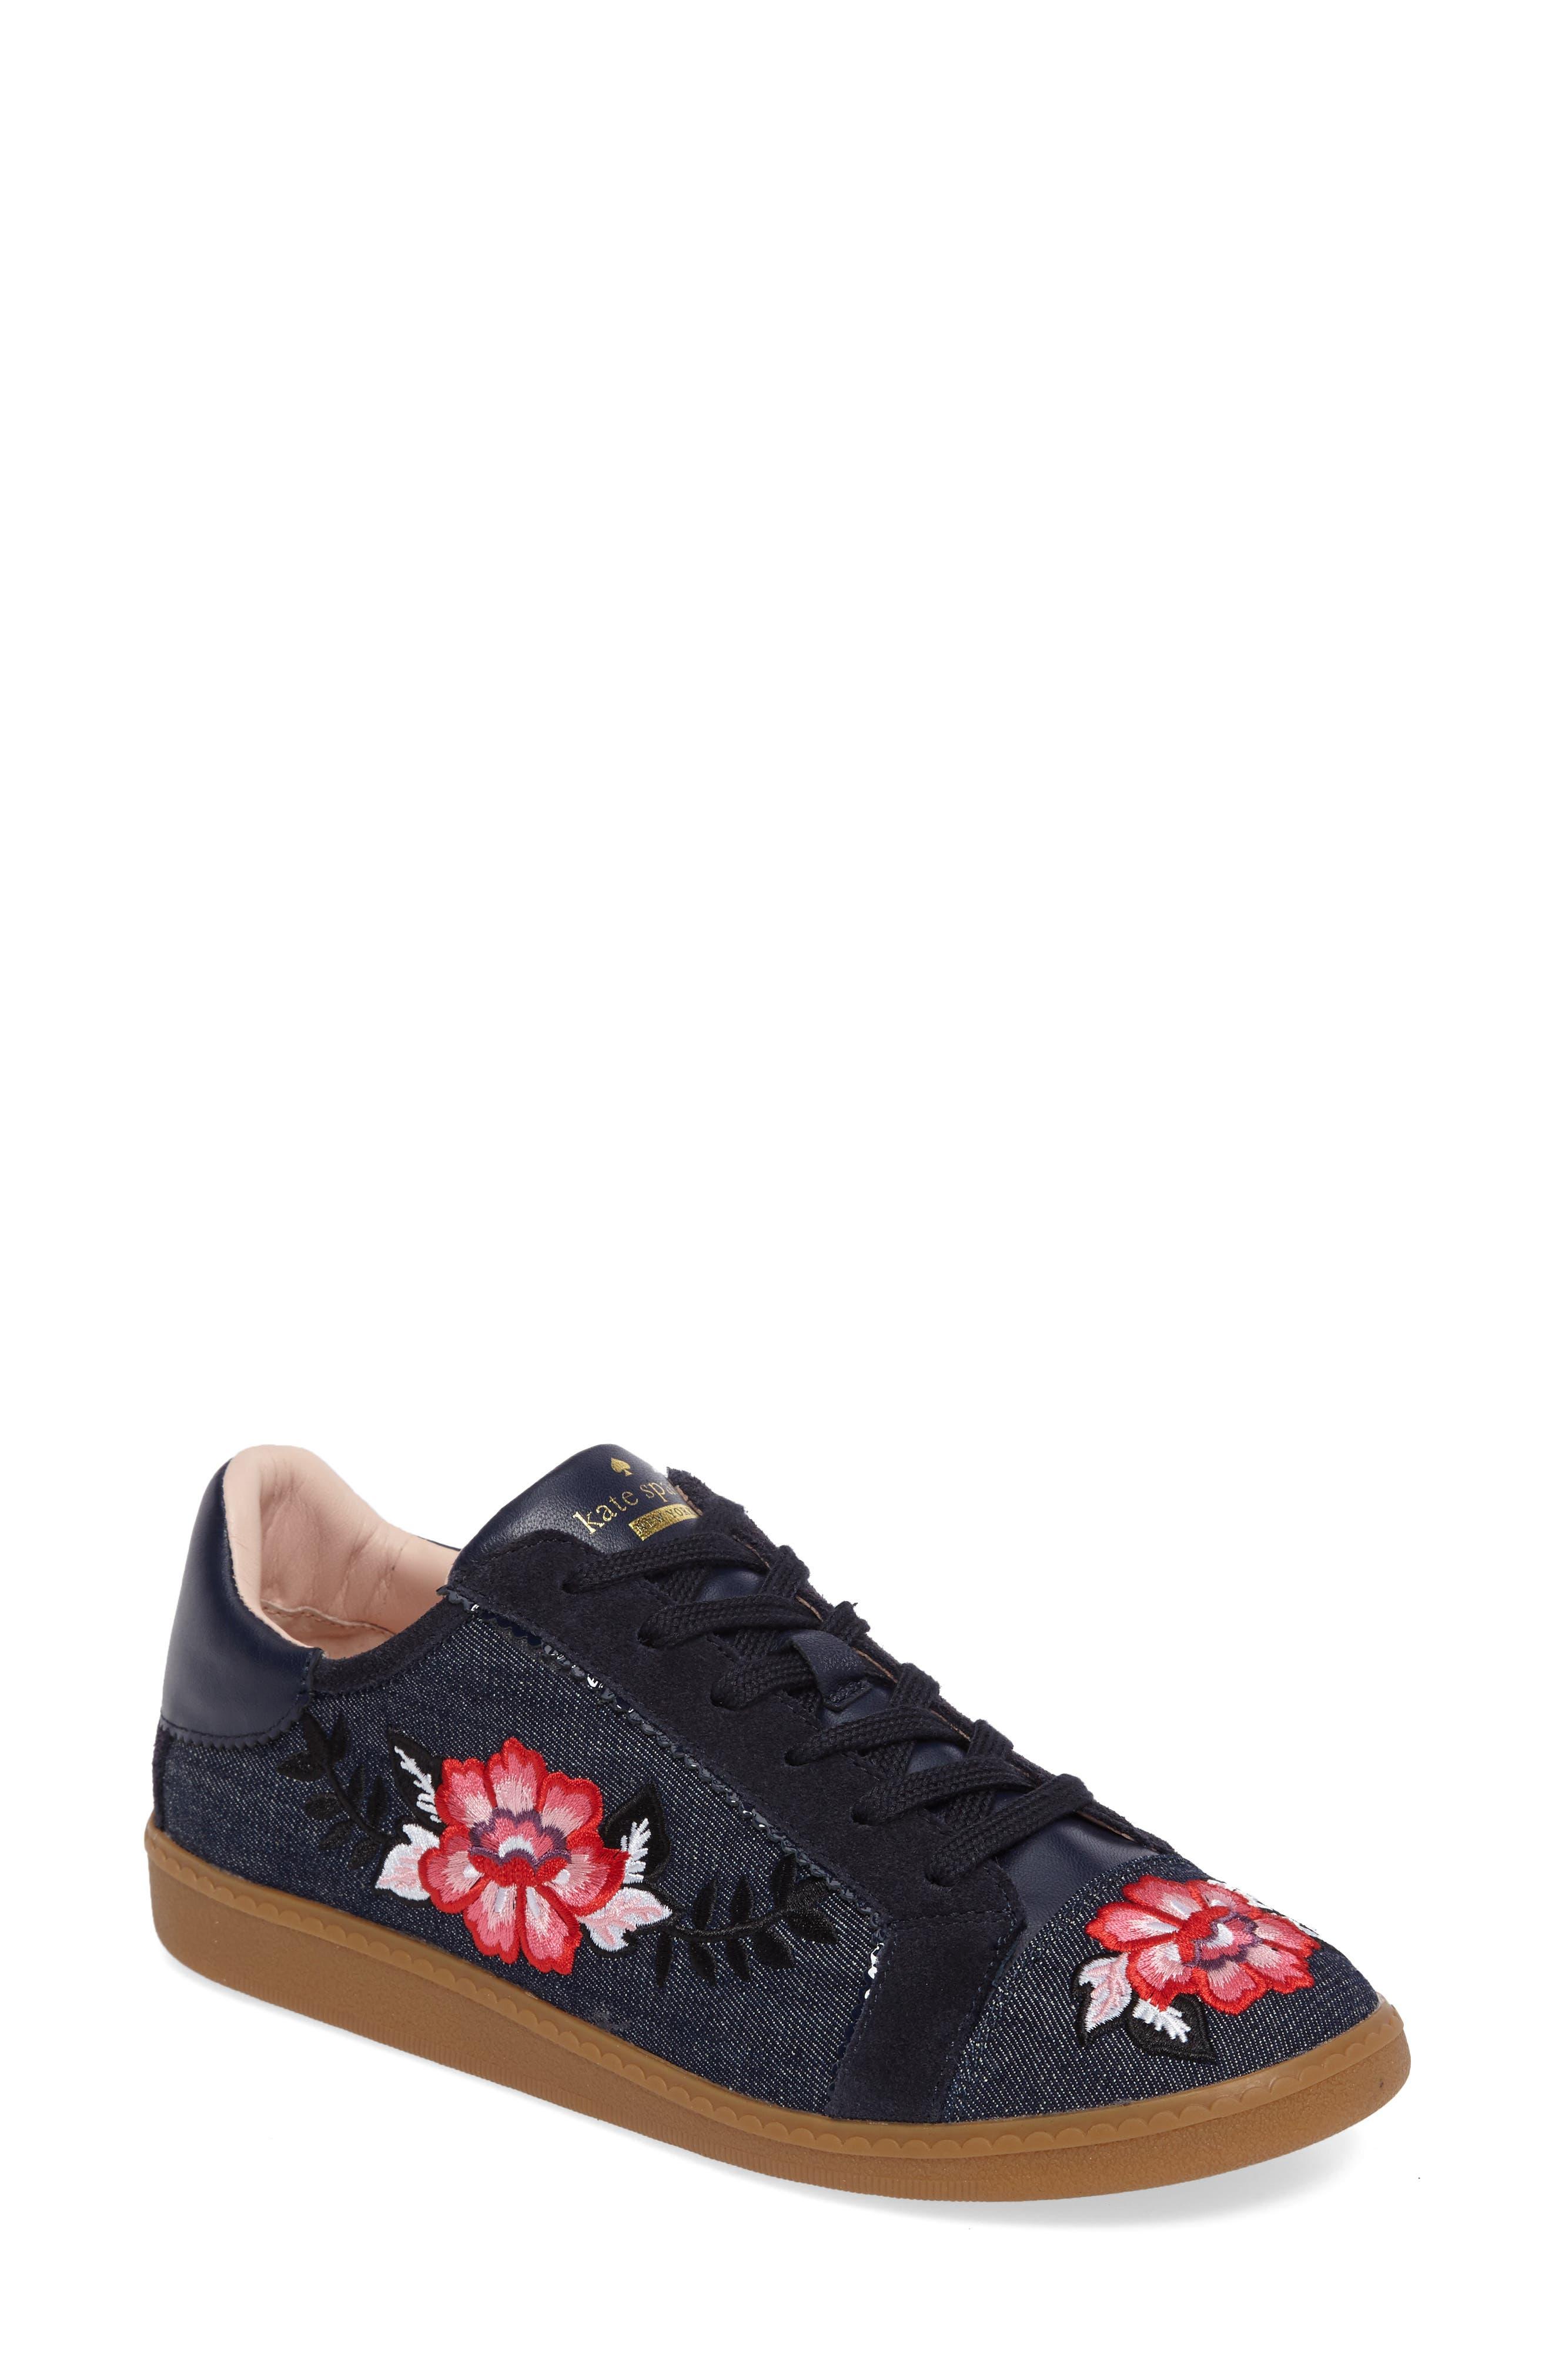 everhart sneaker,                             Main thumbnail 1, color,                             Indigo Denim Navy Suede